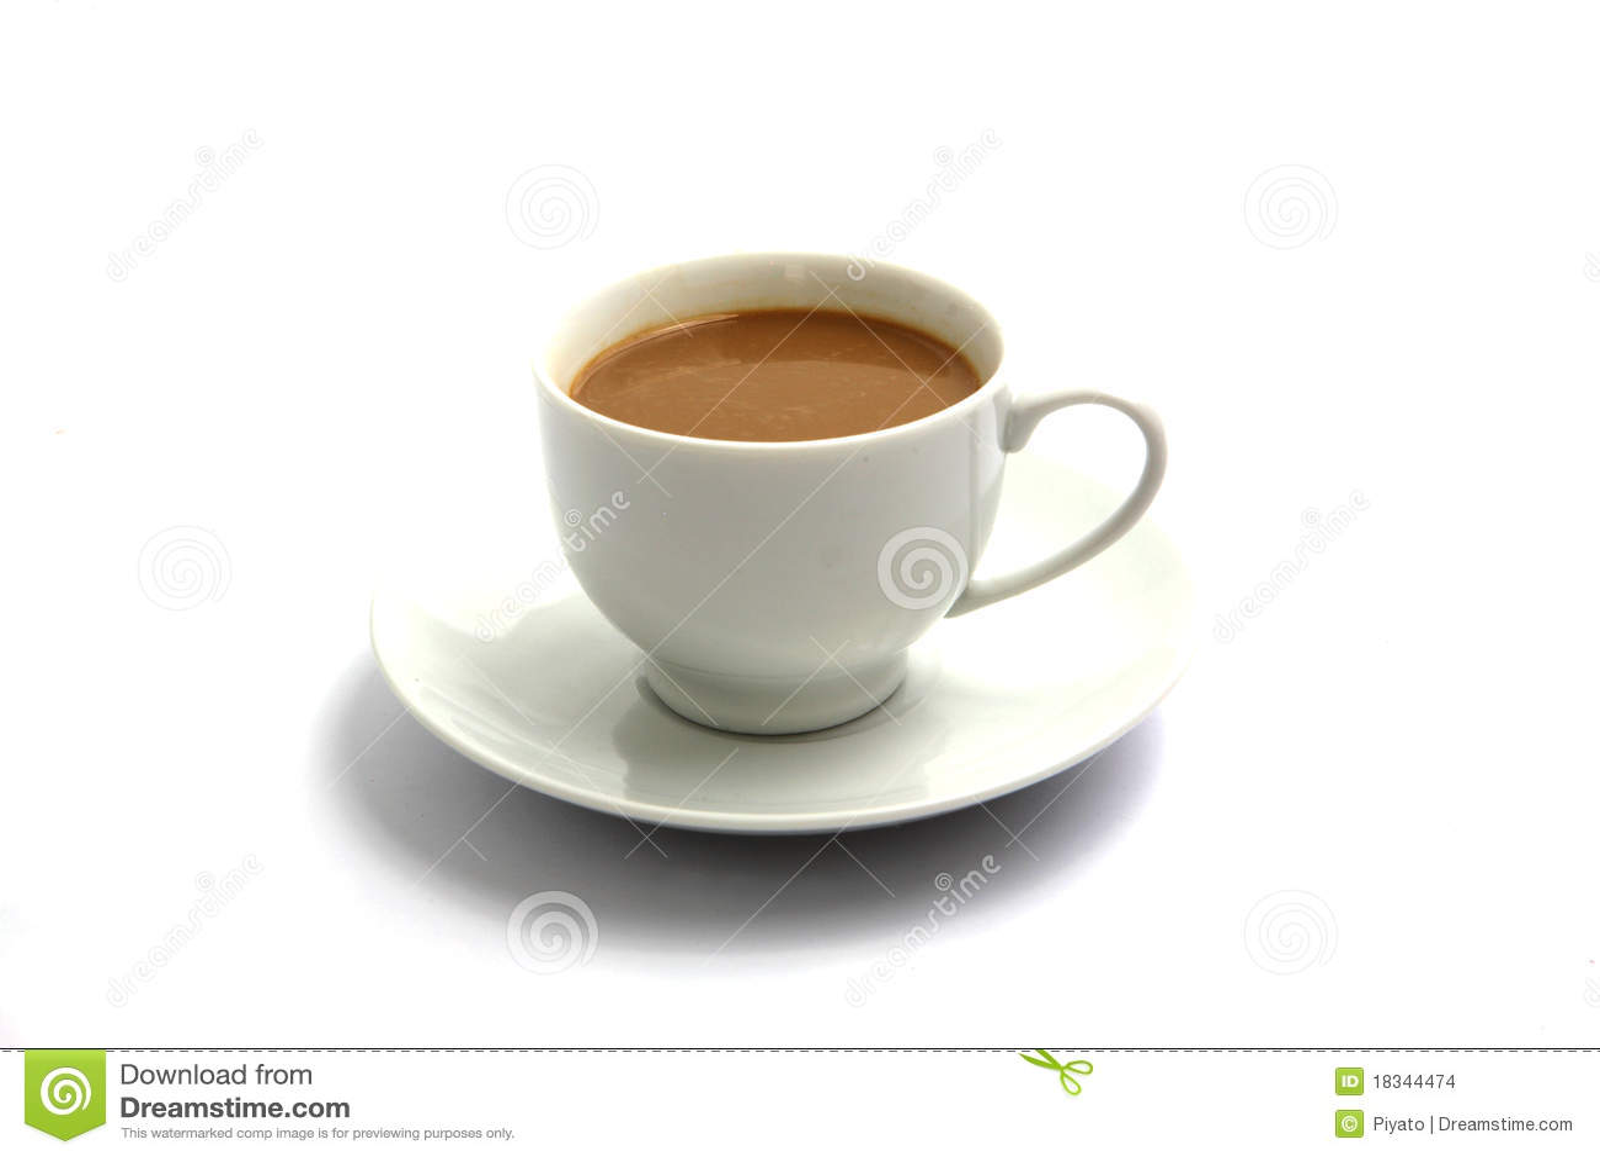 hot coffee white background -#main